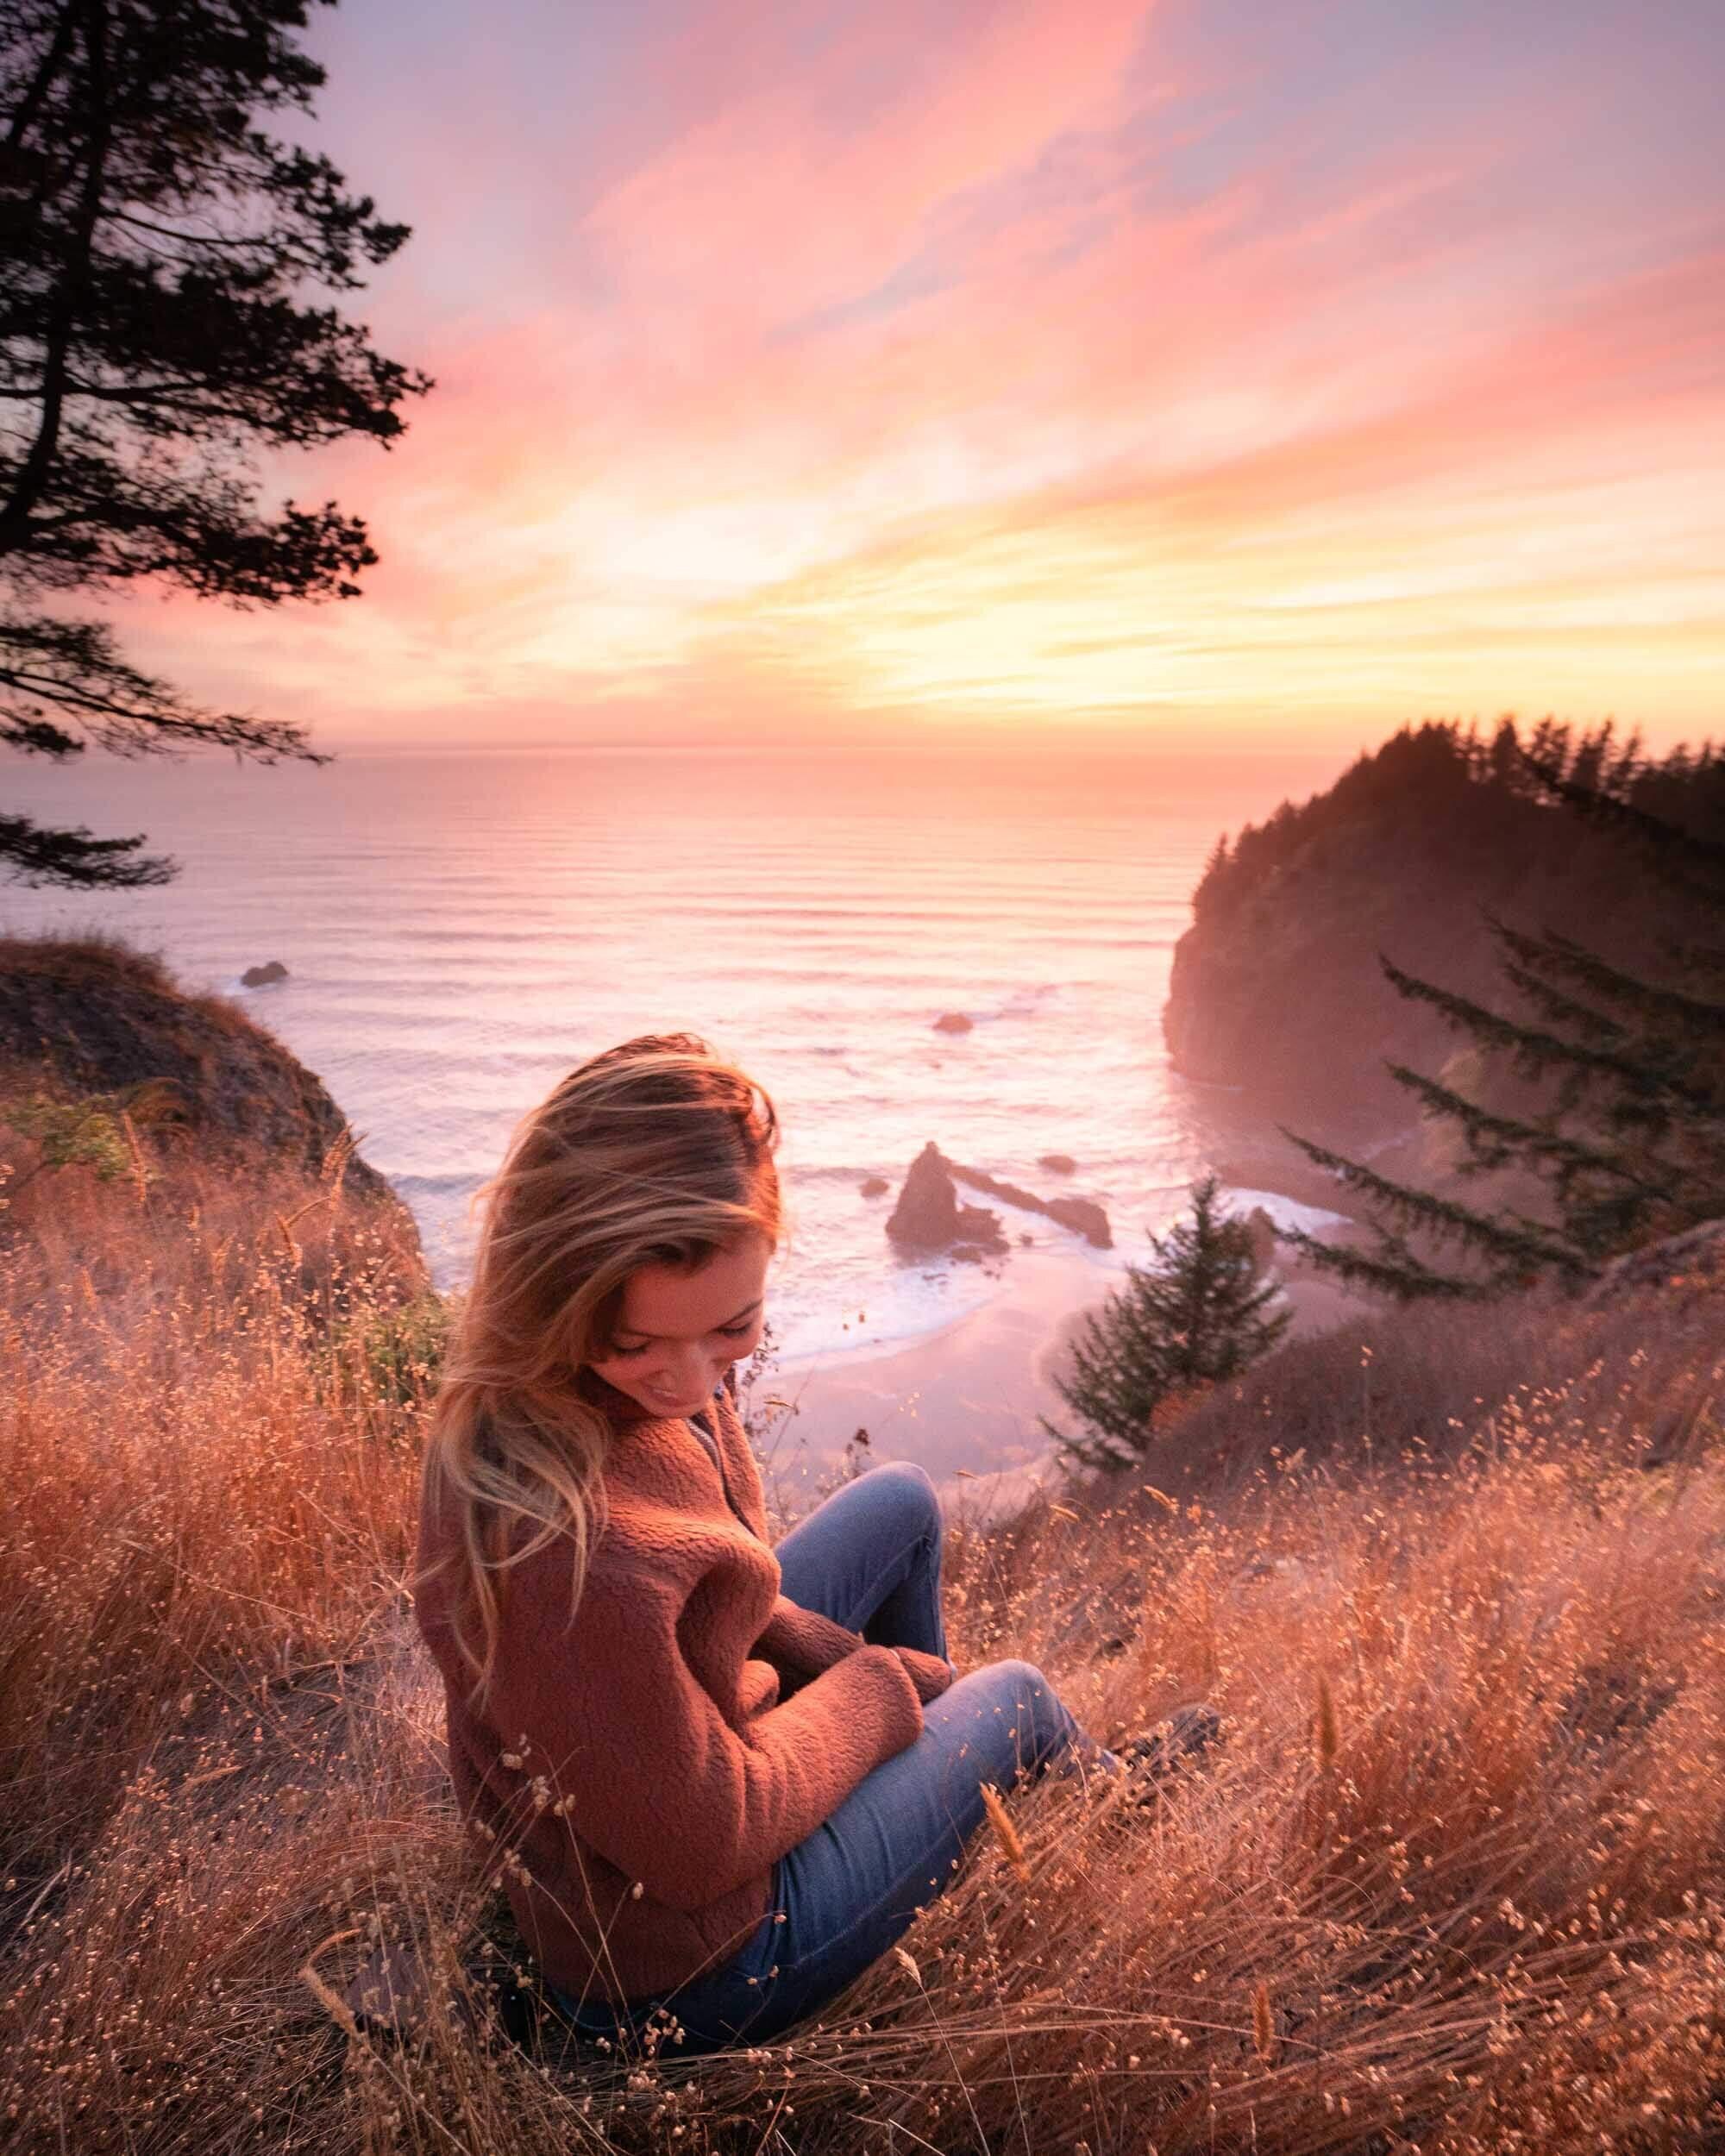 A stunning sunset on the Oregon Coast along the Samuel H. Boardman State Scenic Corridor.